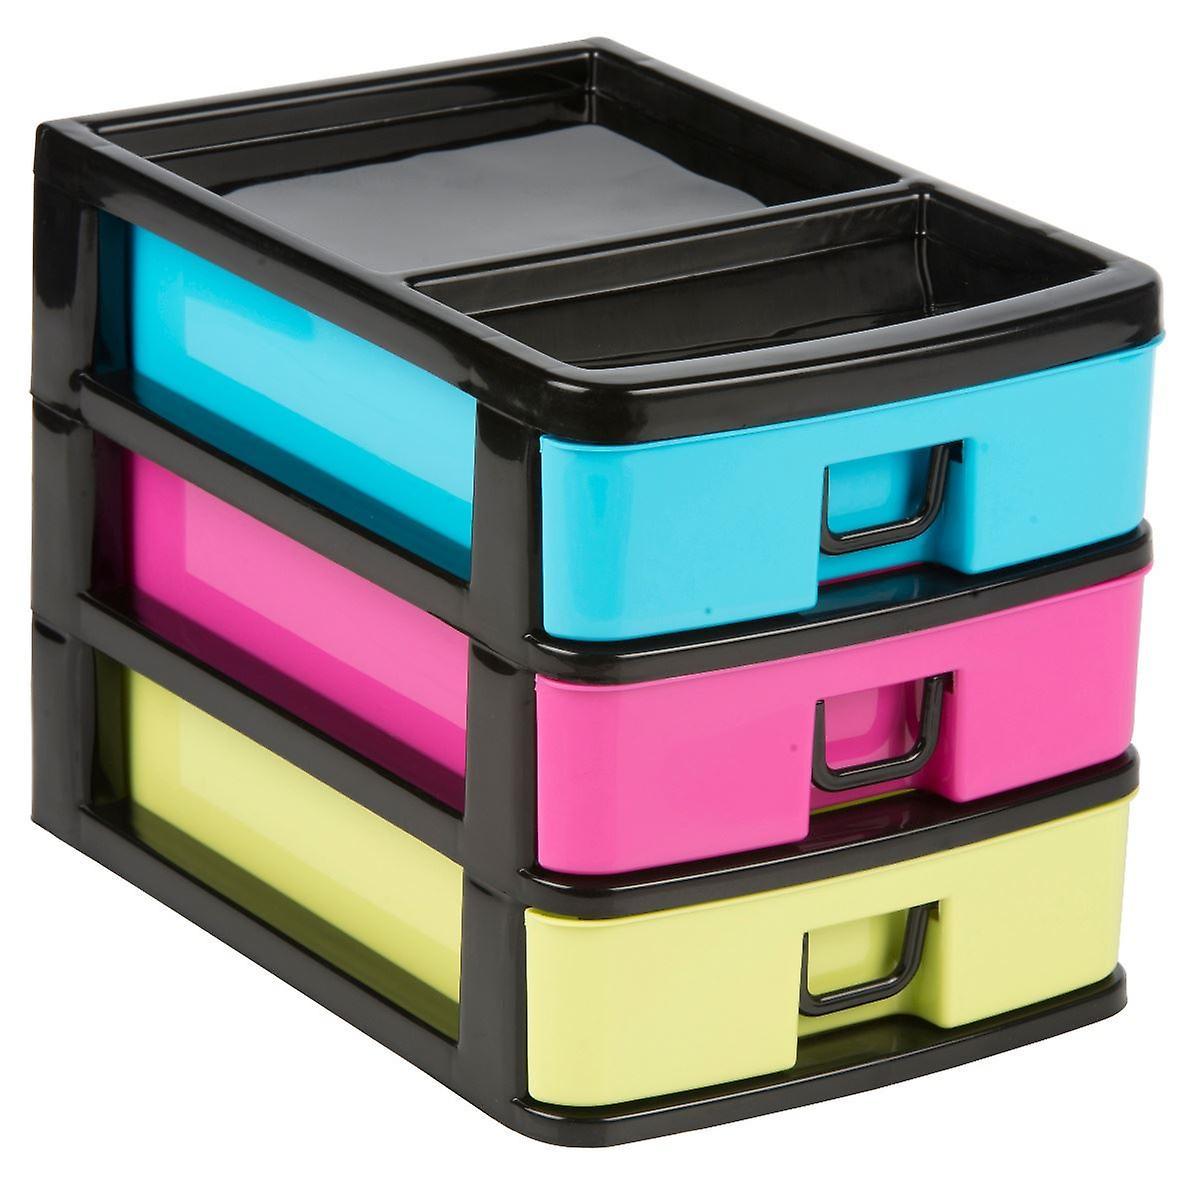 27x18.5x20cm Plastic 3 Drawers Storage Box Household Garage Organiser